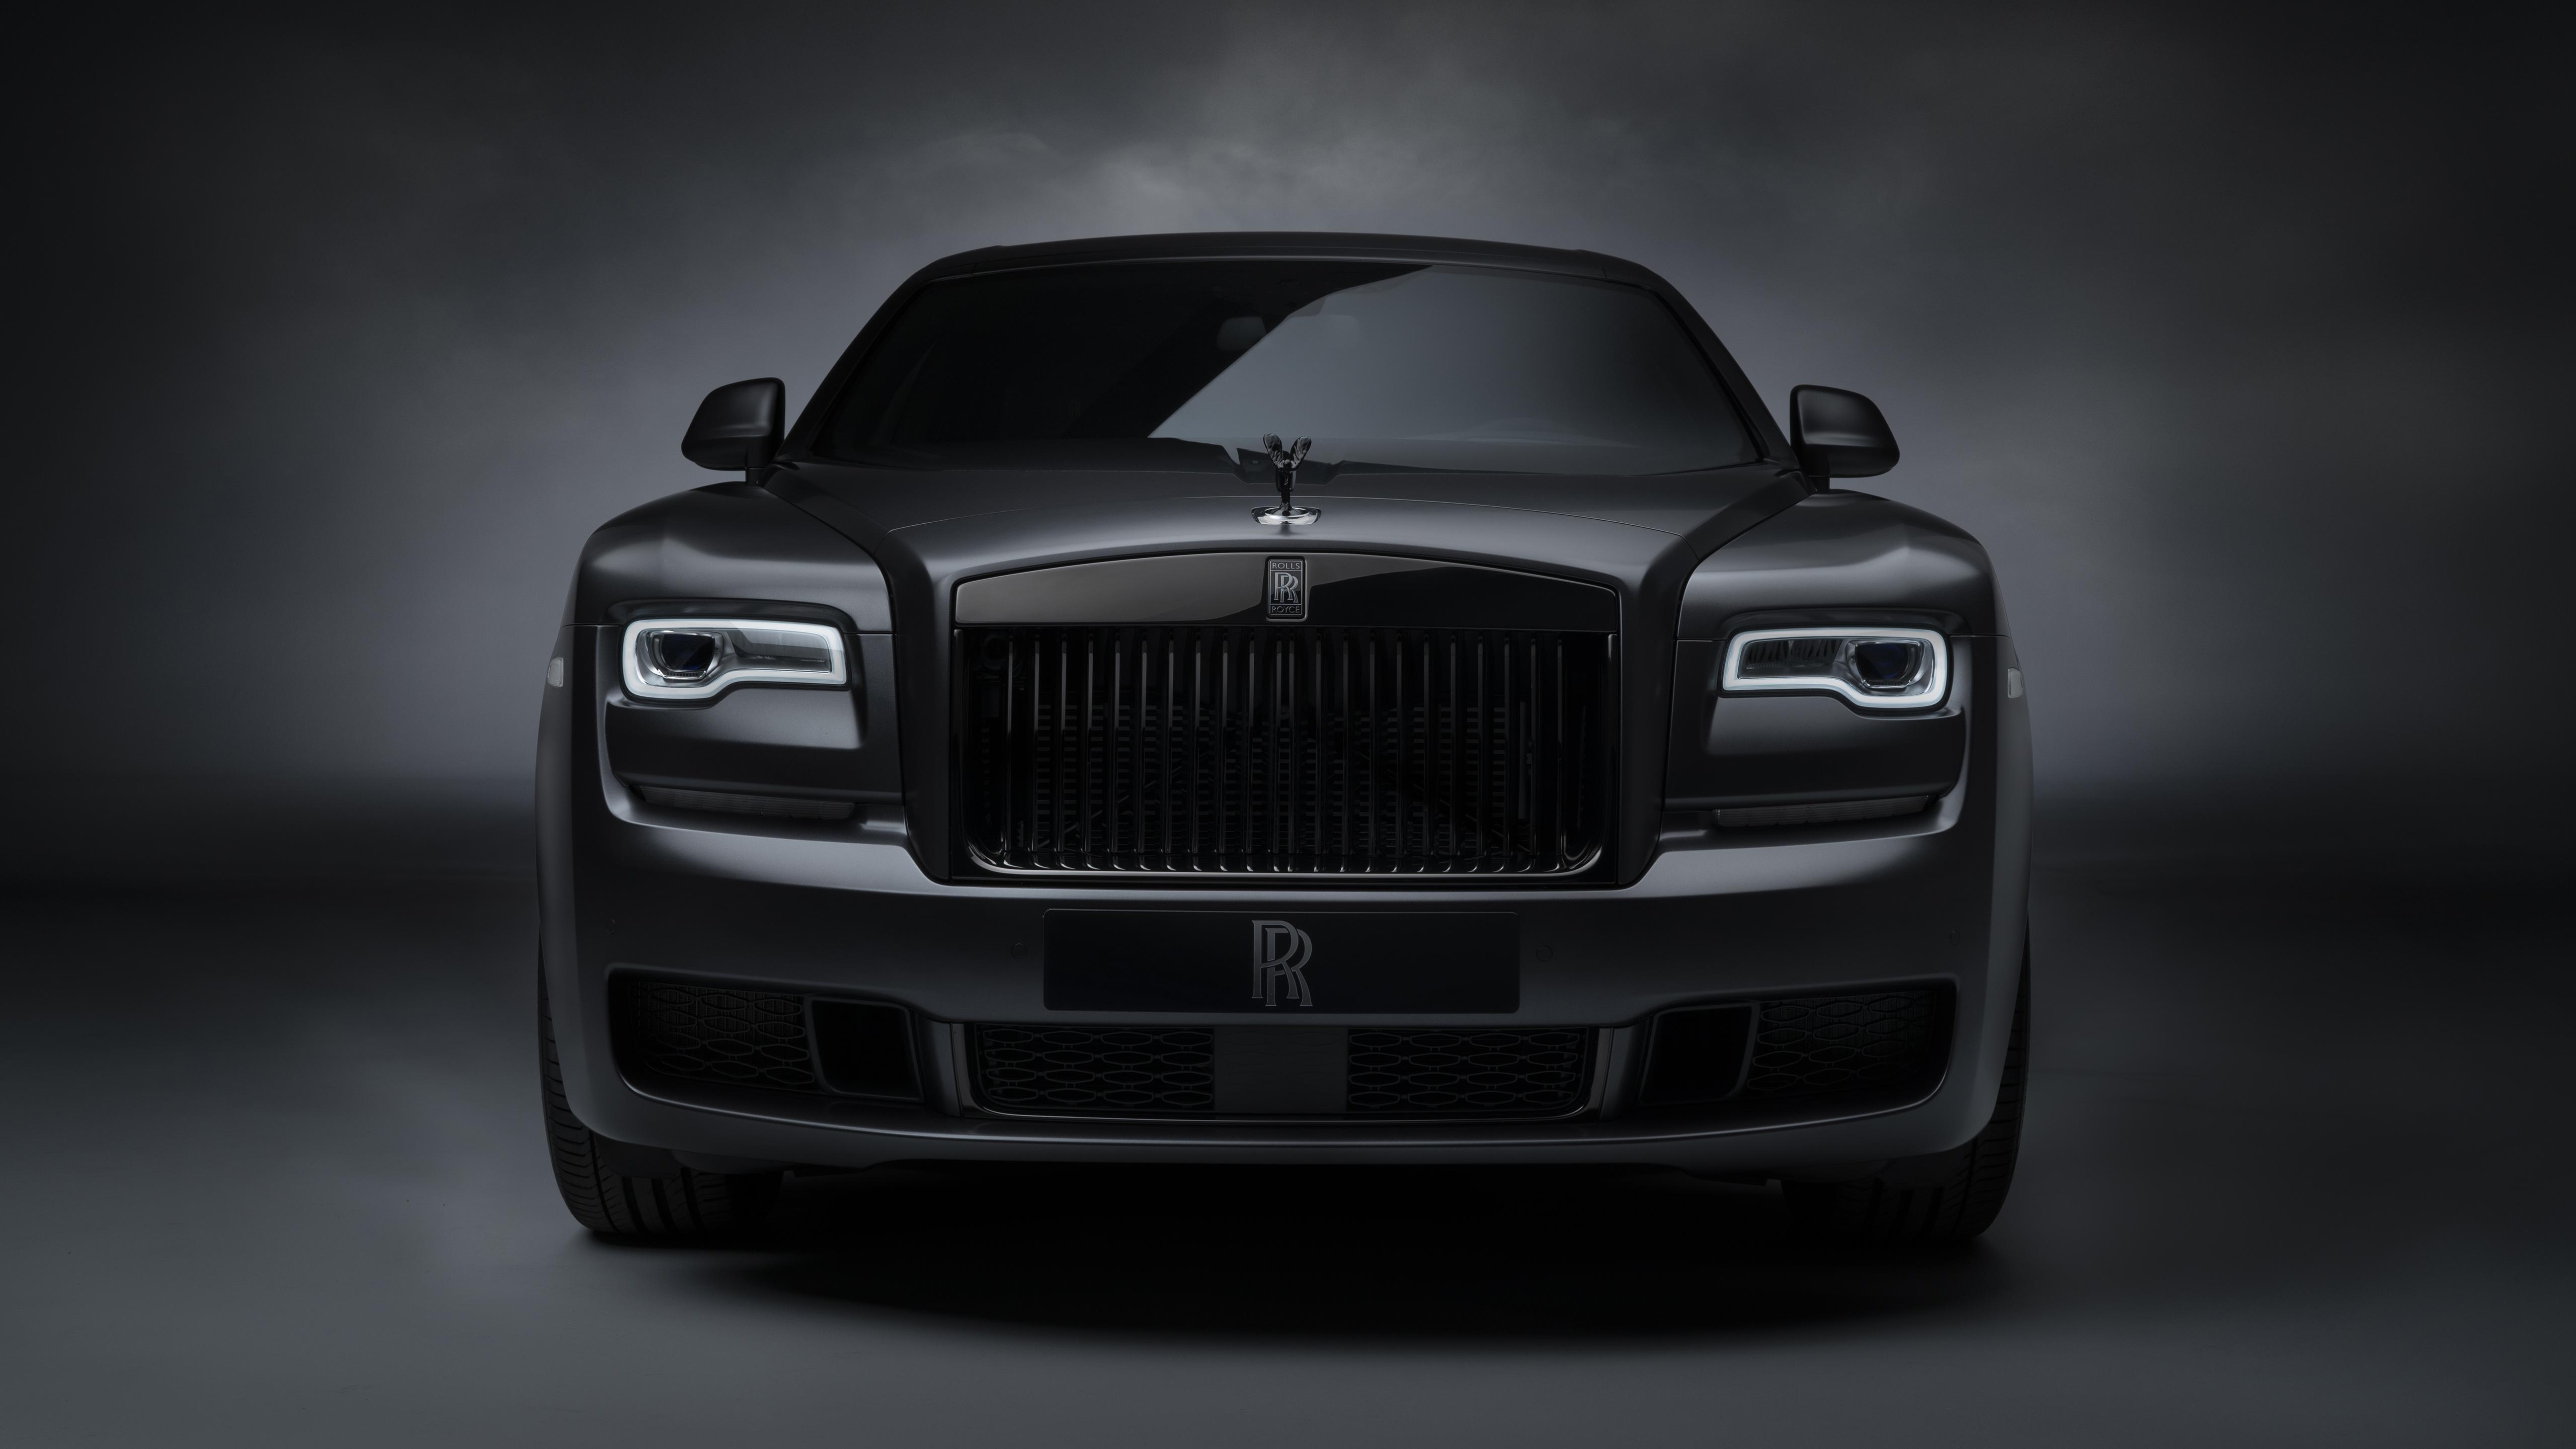 Rolls-Royce Ghost Black Badge 2019 5K 2 Wallpaper | HD Car ...